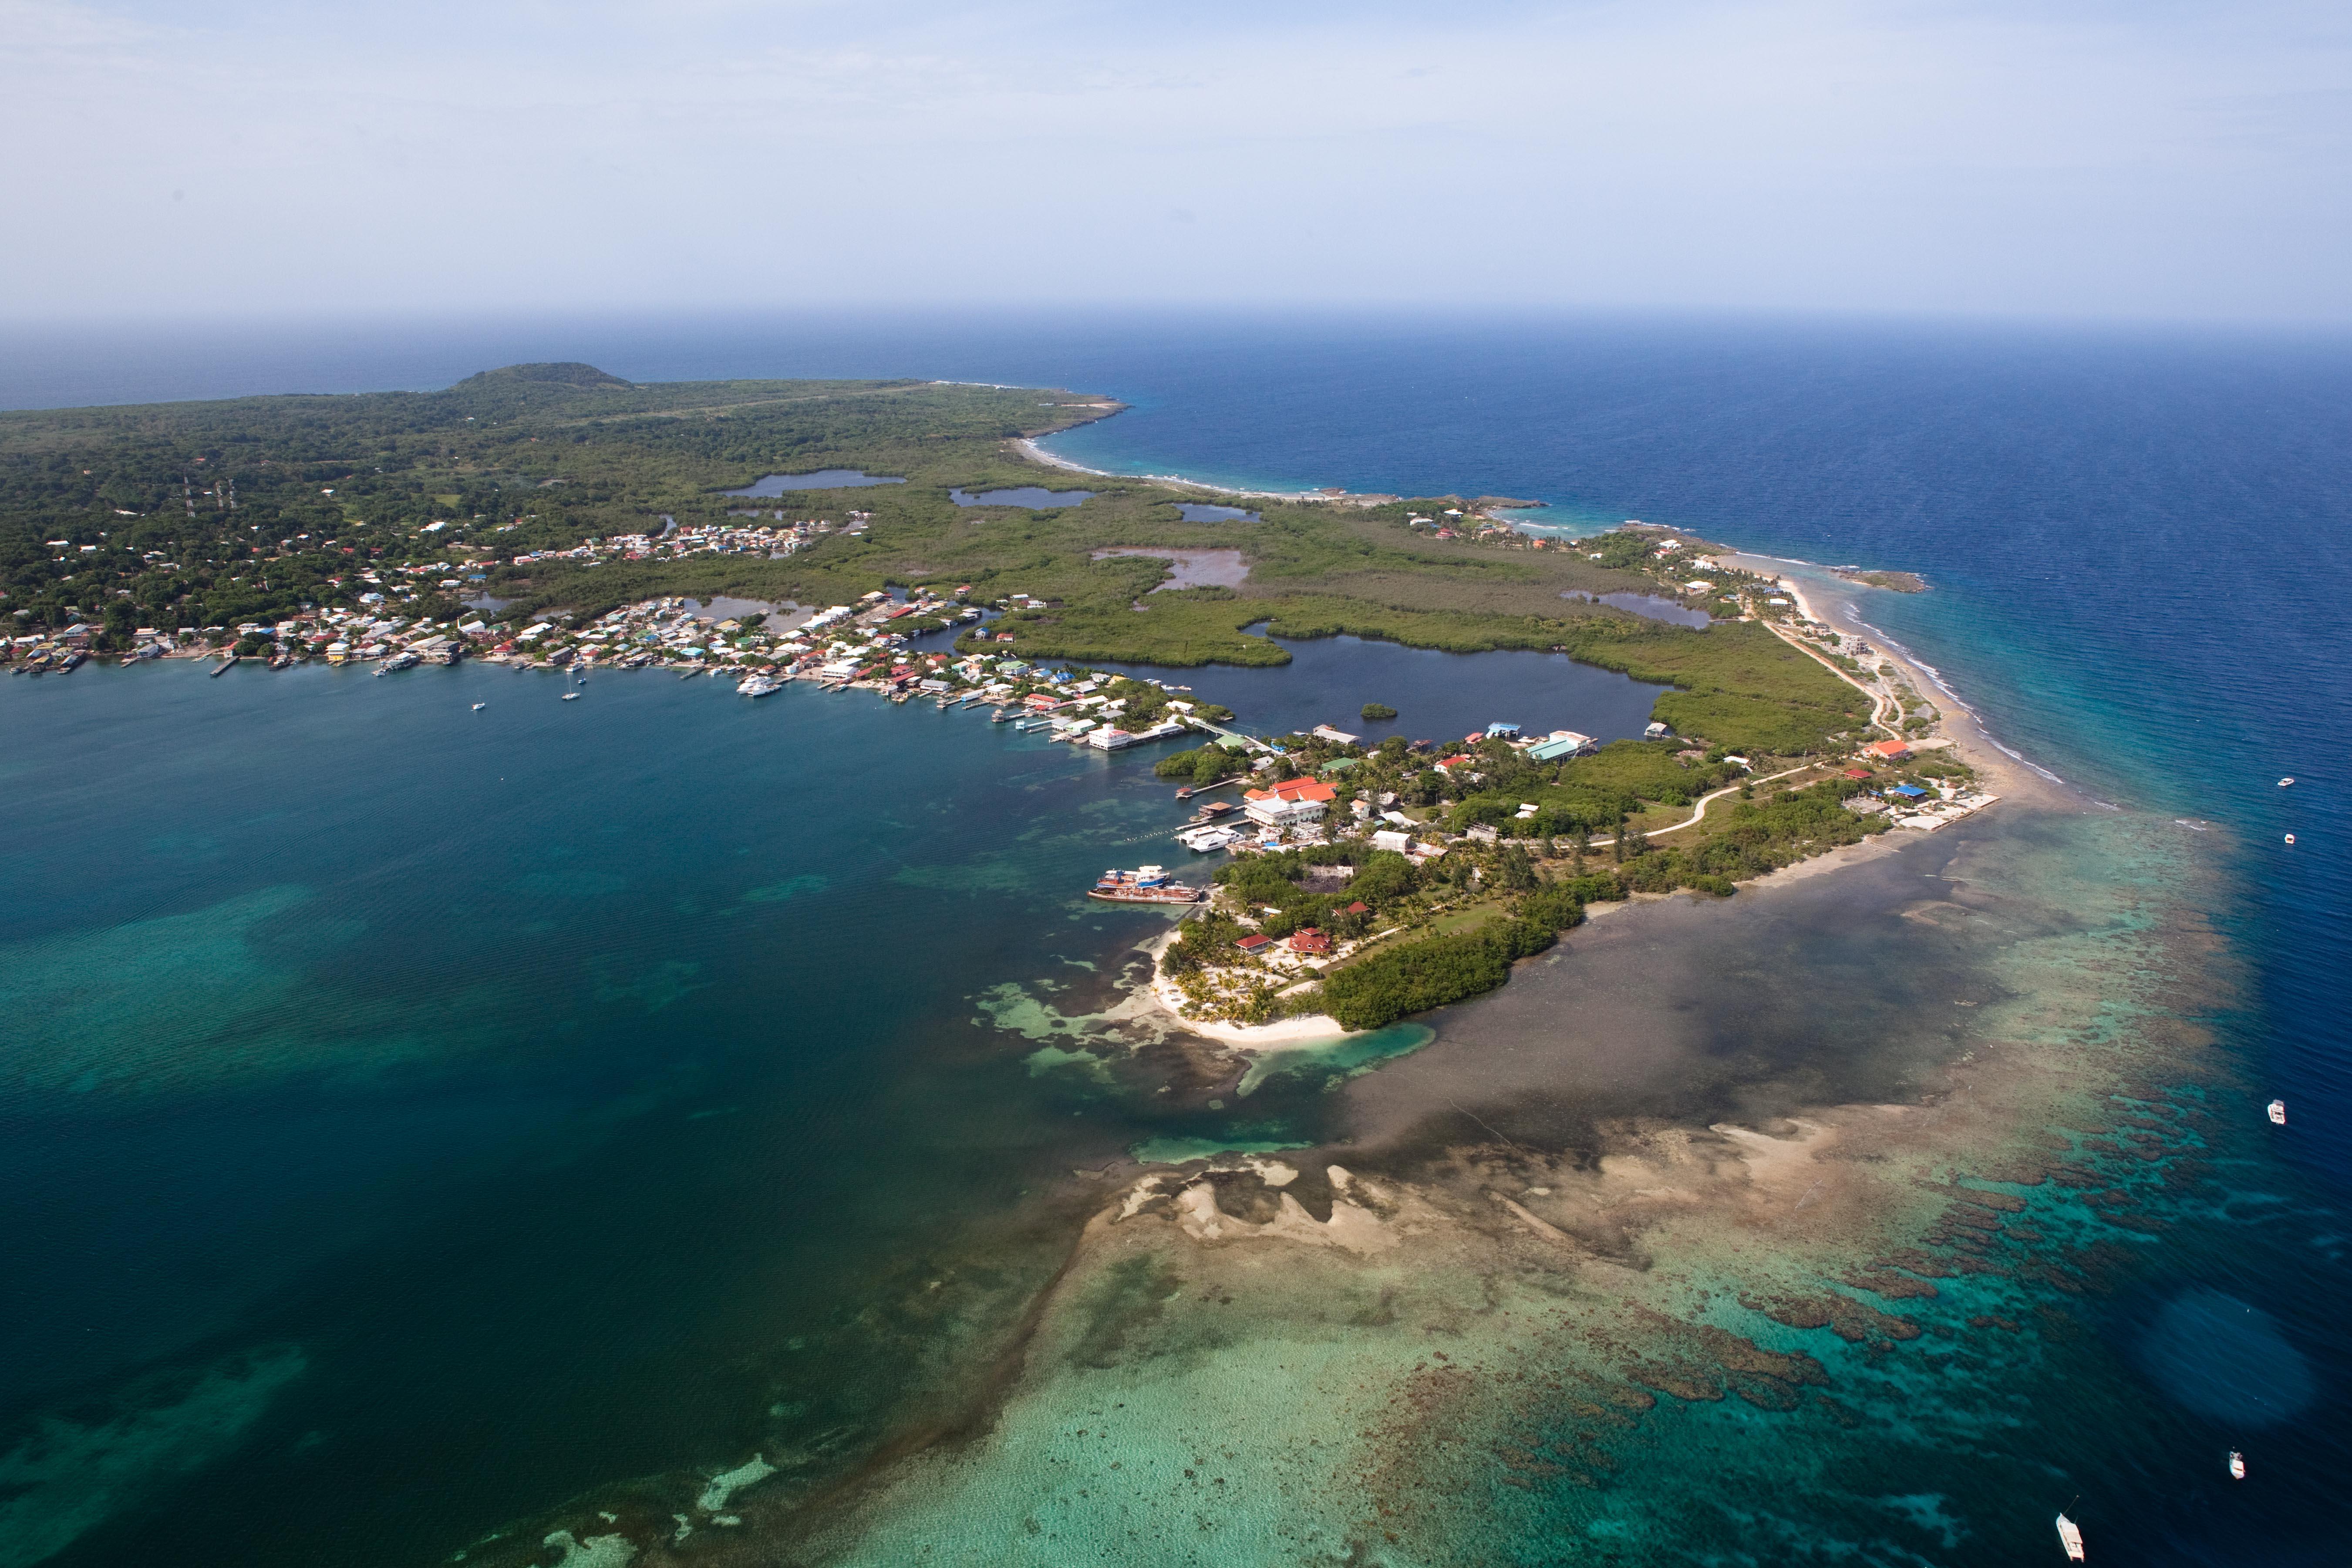 Utila Isla De Bahia The Authentic Island Experience Still Exists